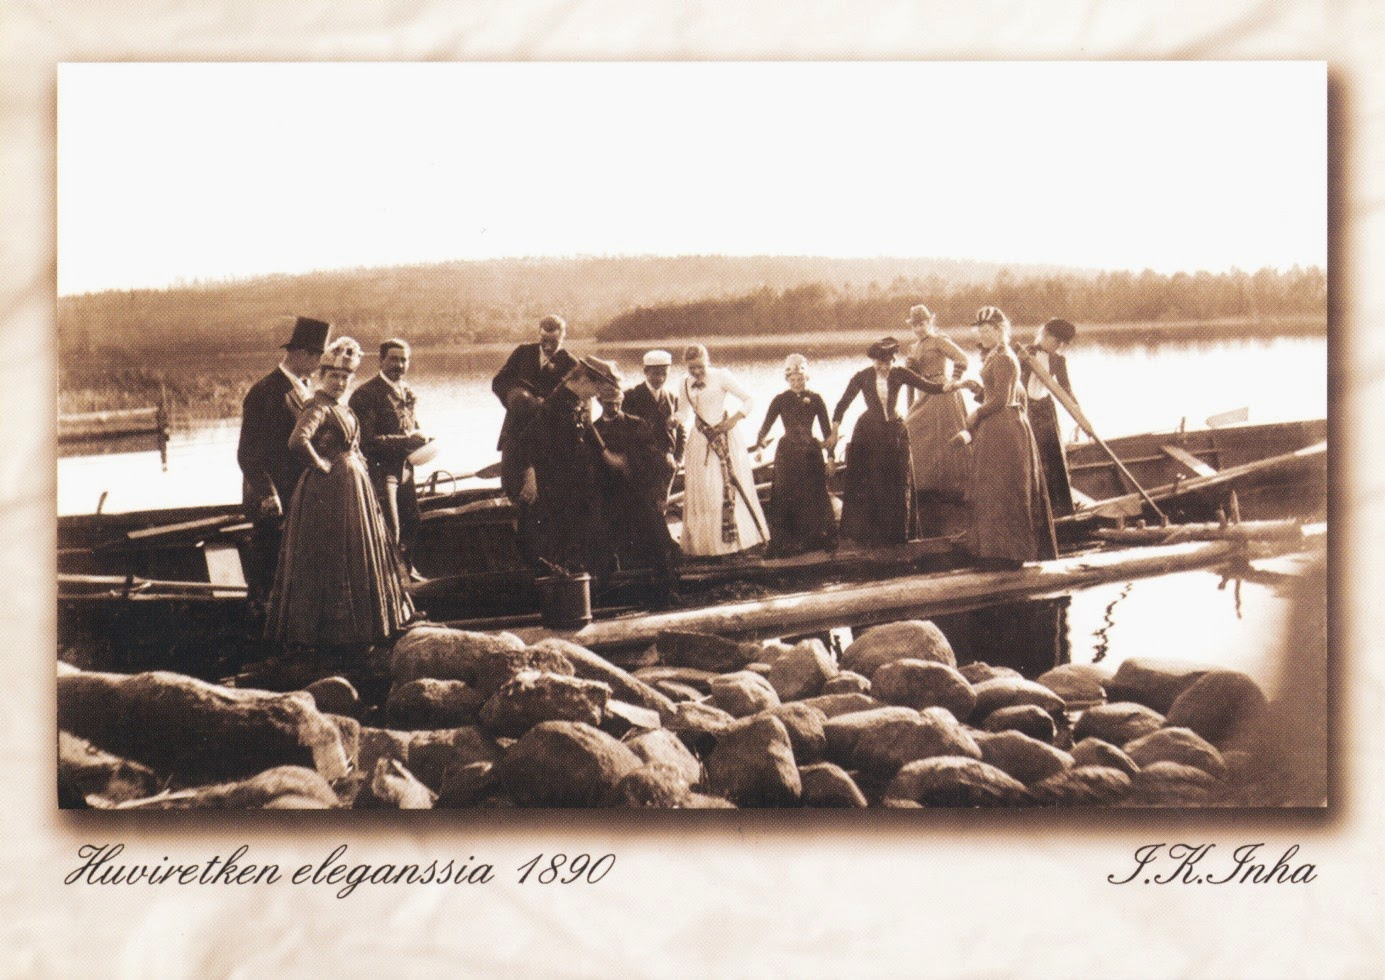 lake, into konrad inha, Finland, postcard